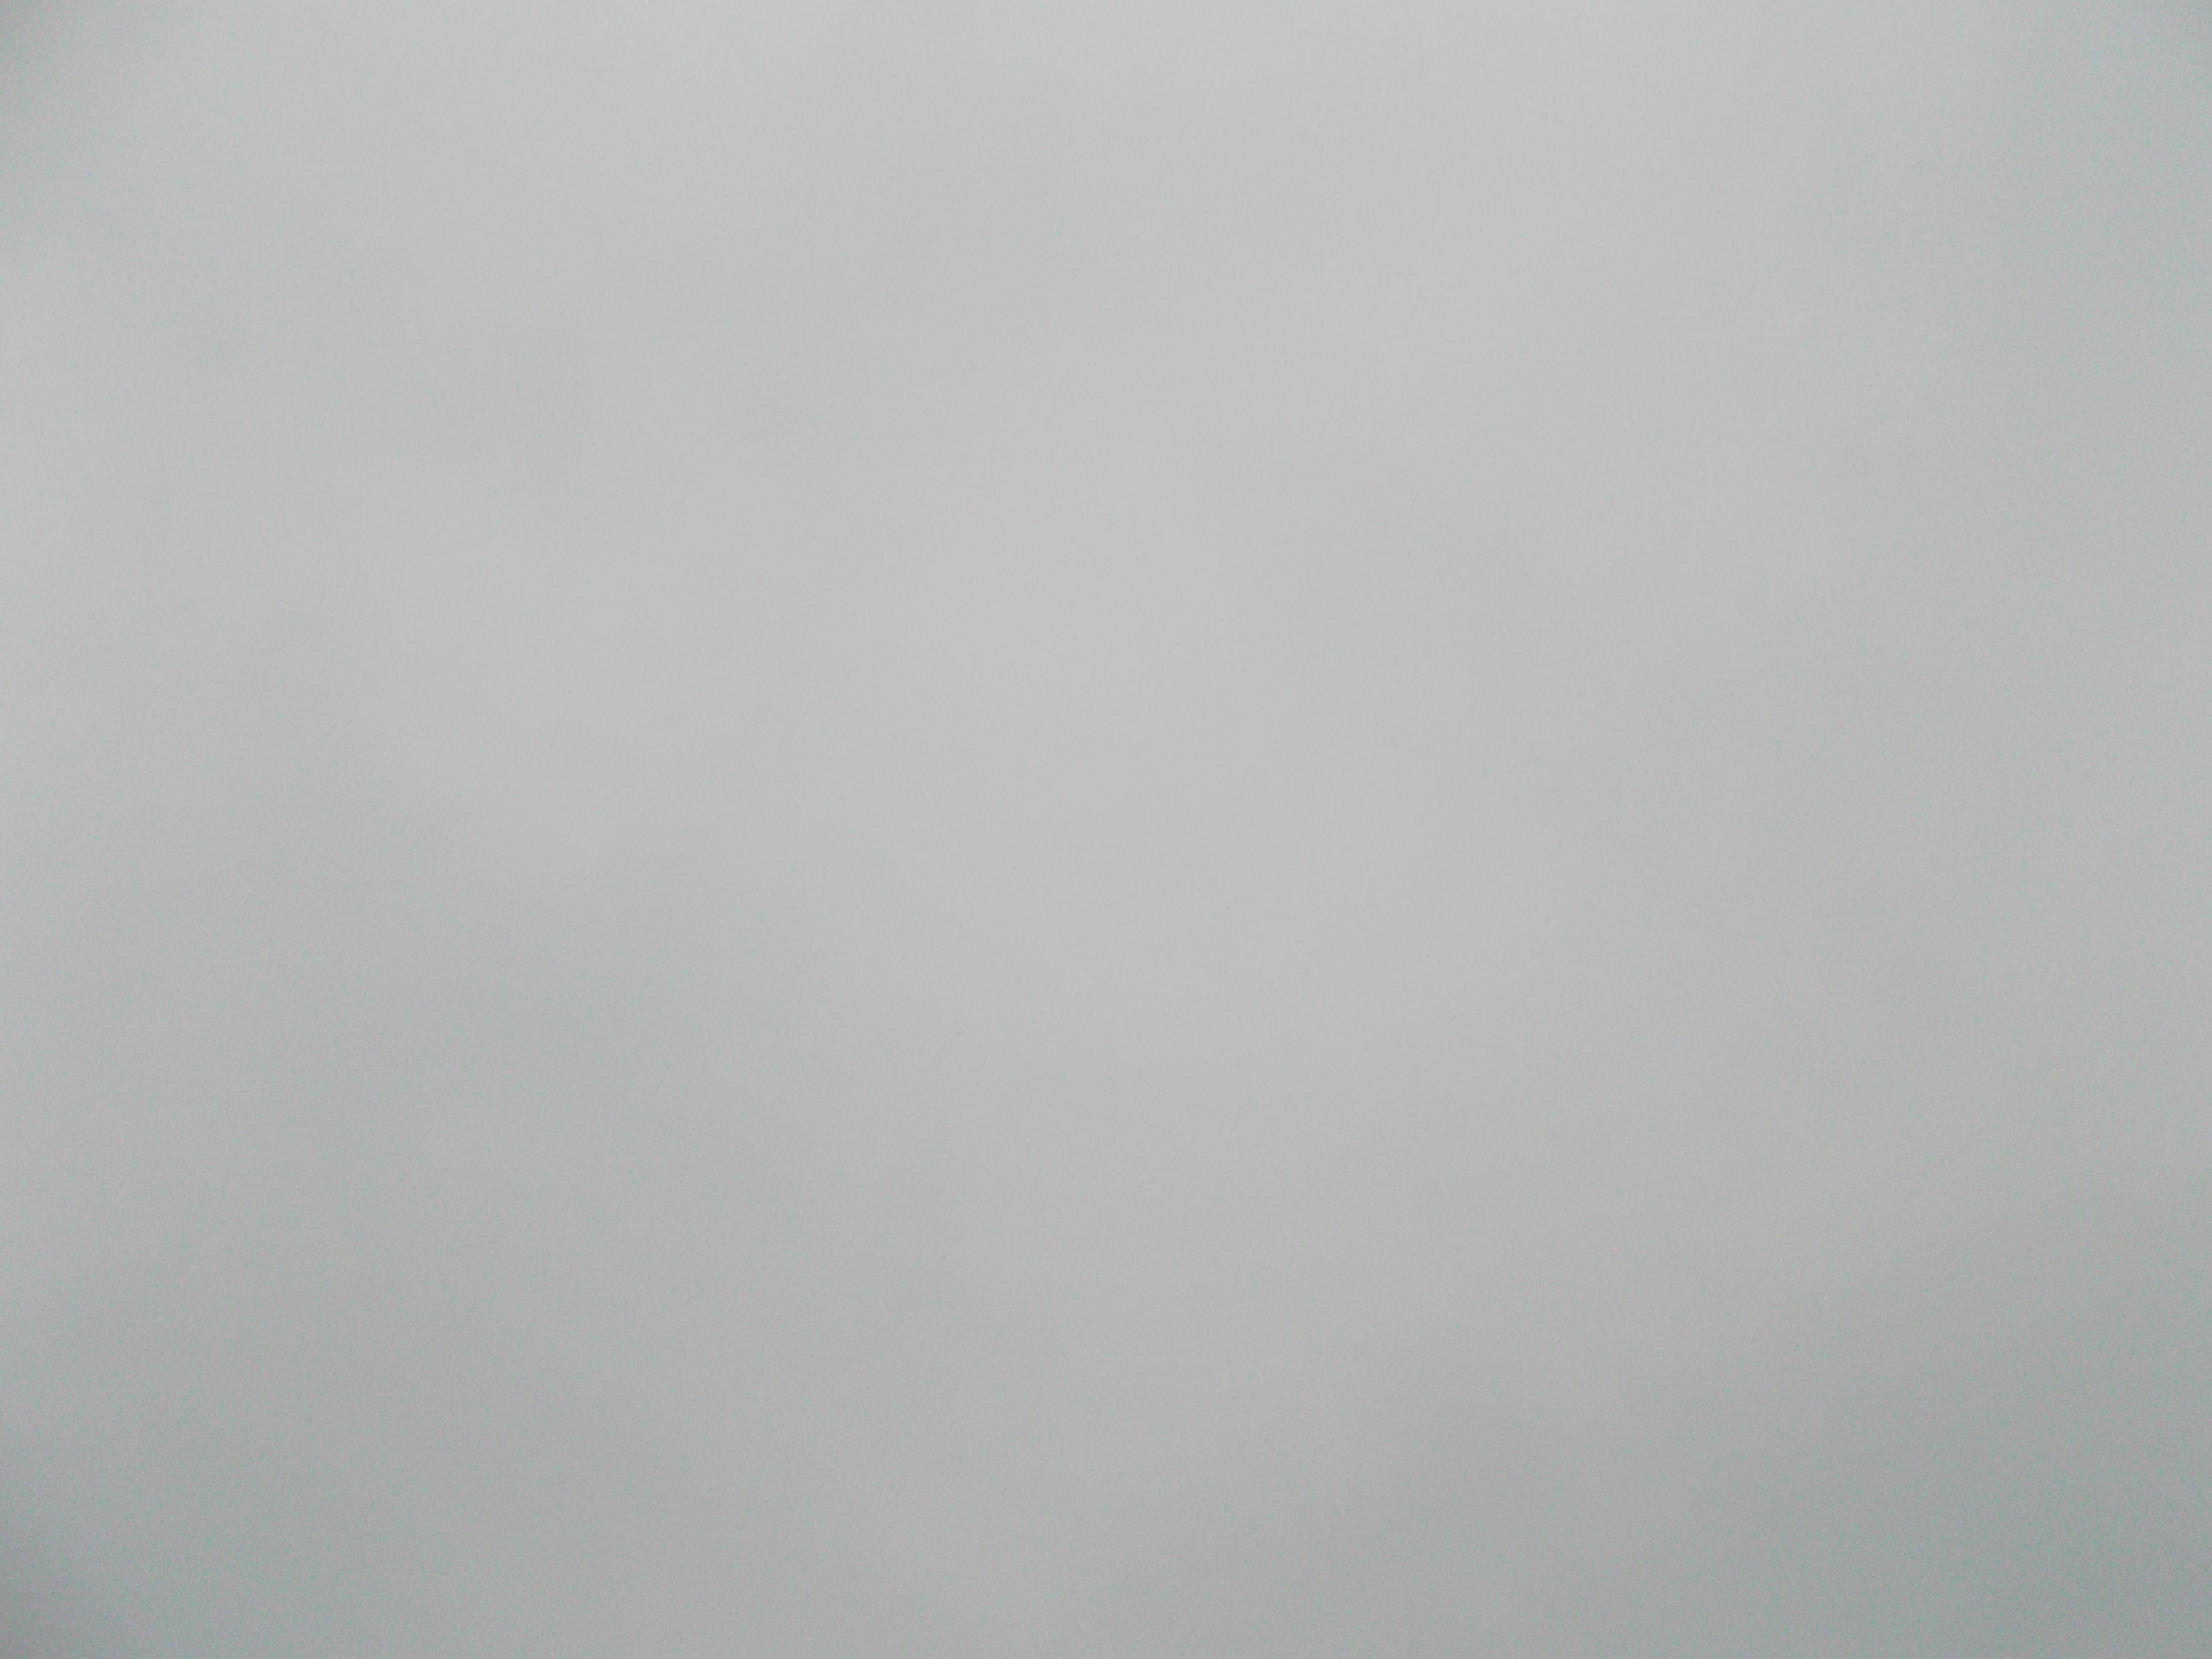 2013-03-26 Longitude -0.371 Latitude 49.182 Altitude 29 Heure 09h05